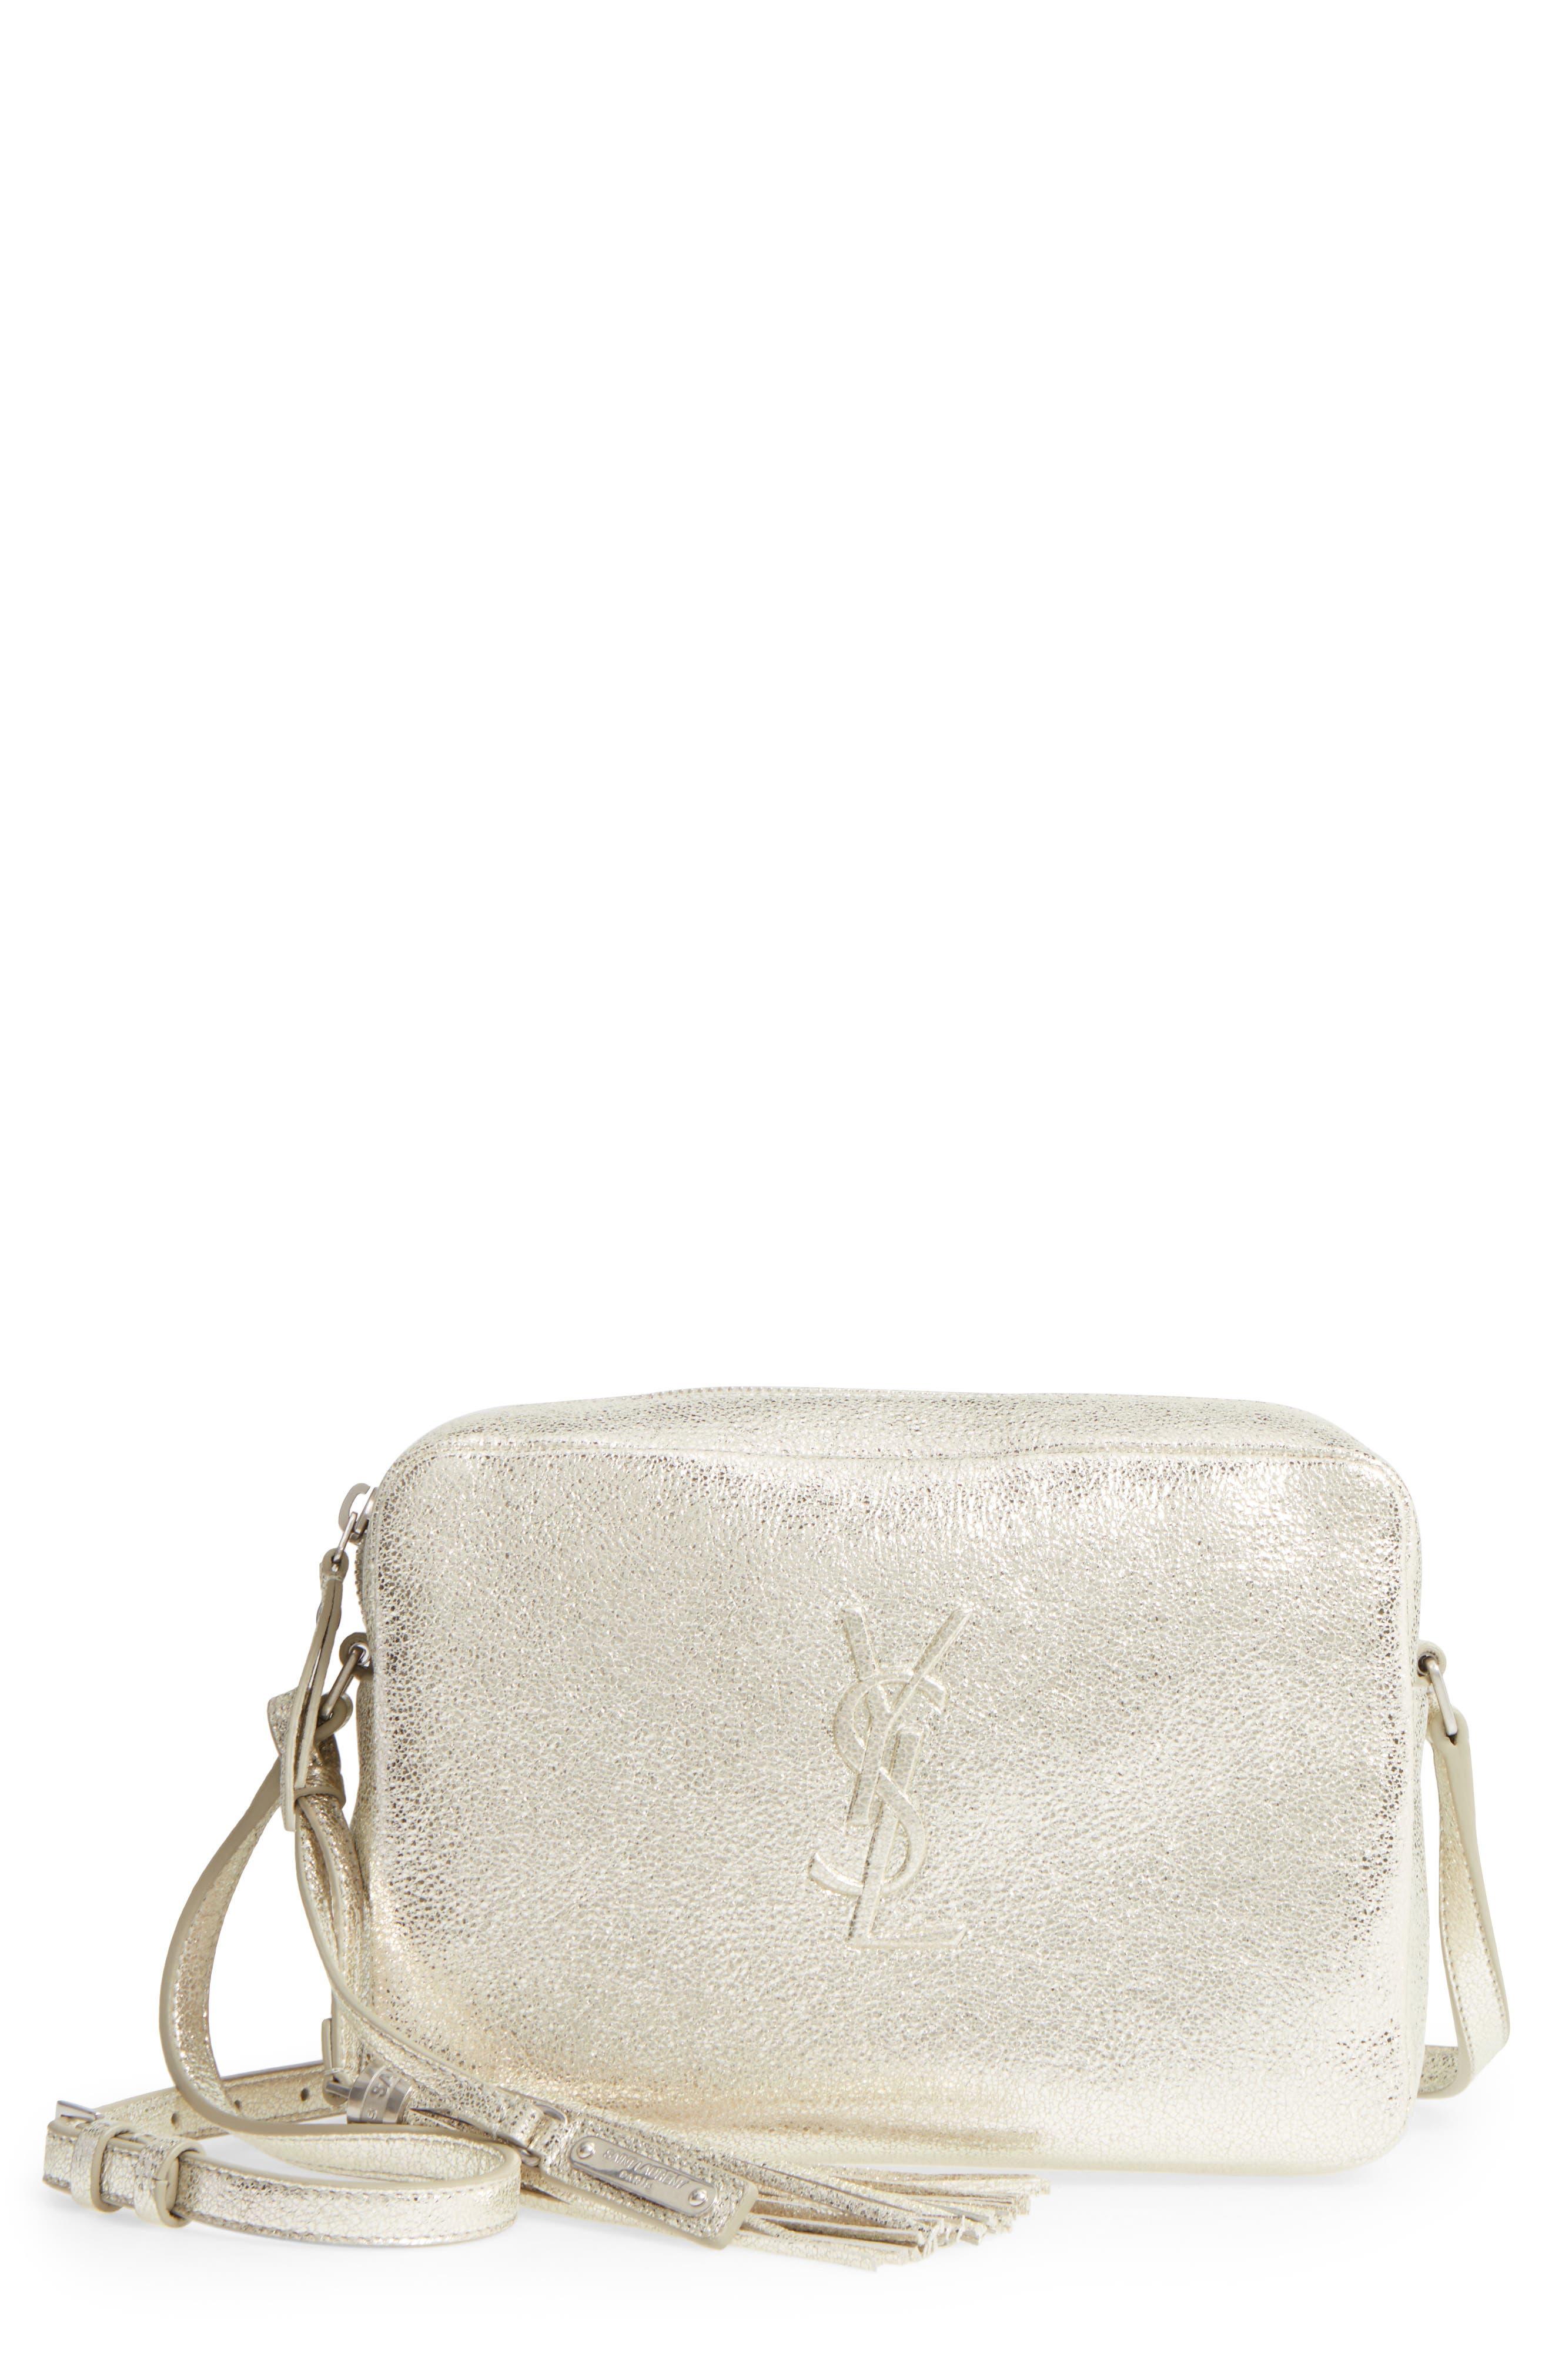 Main Image - Saint Laurent Medium Lou Leather Camera Bag